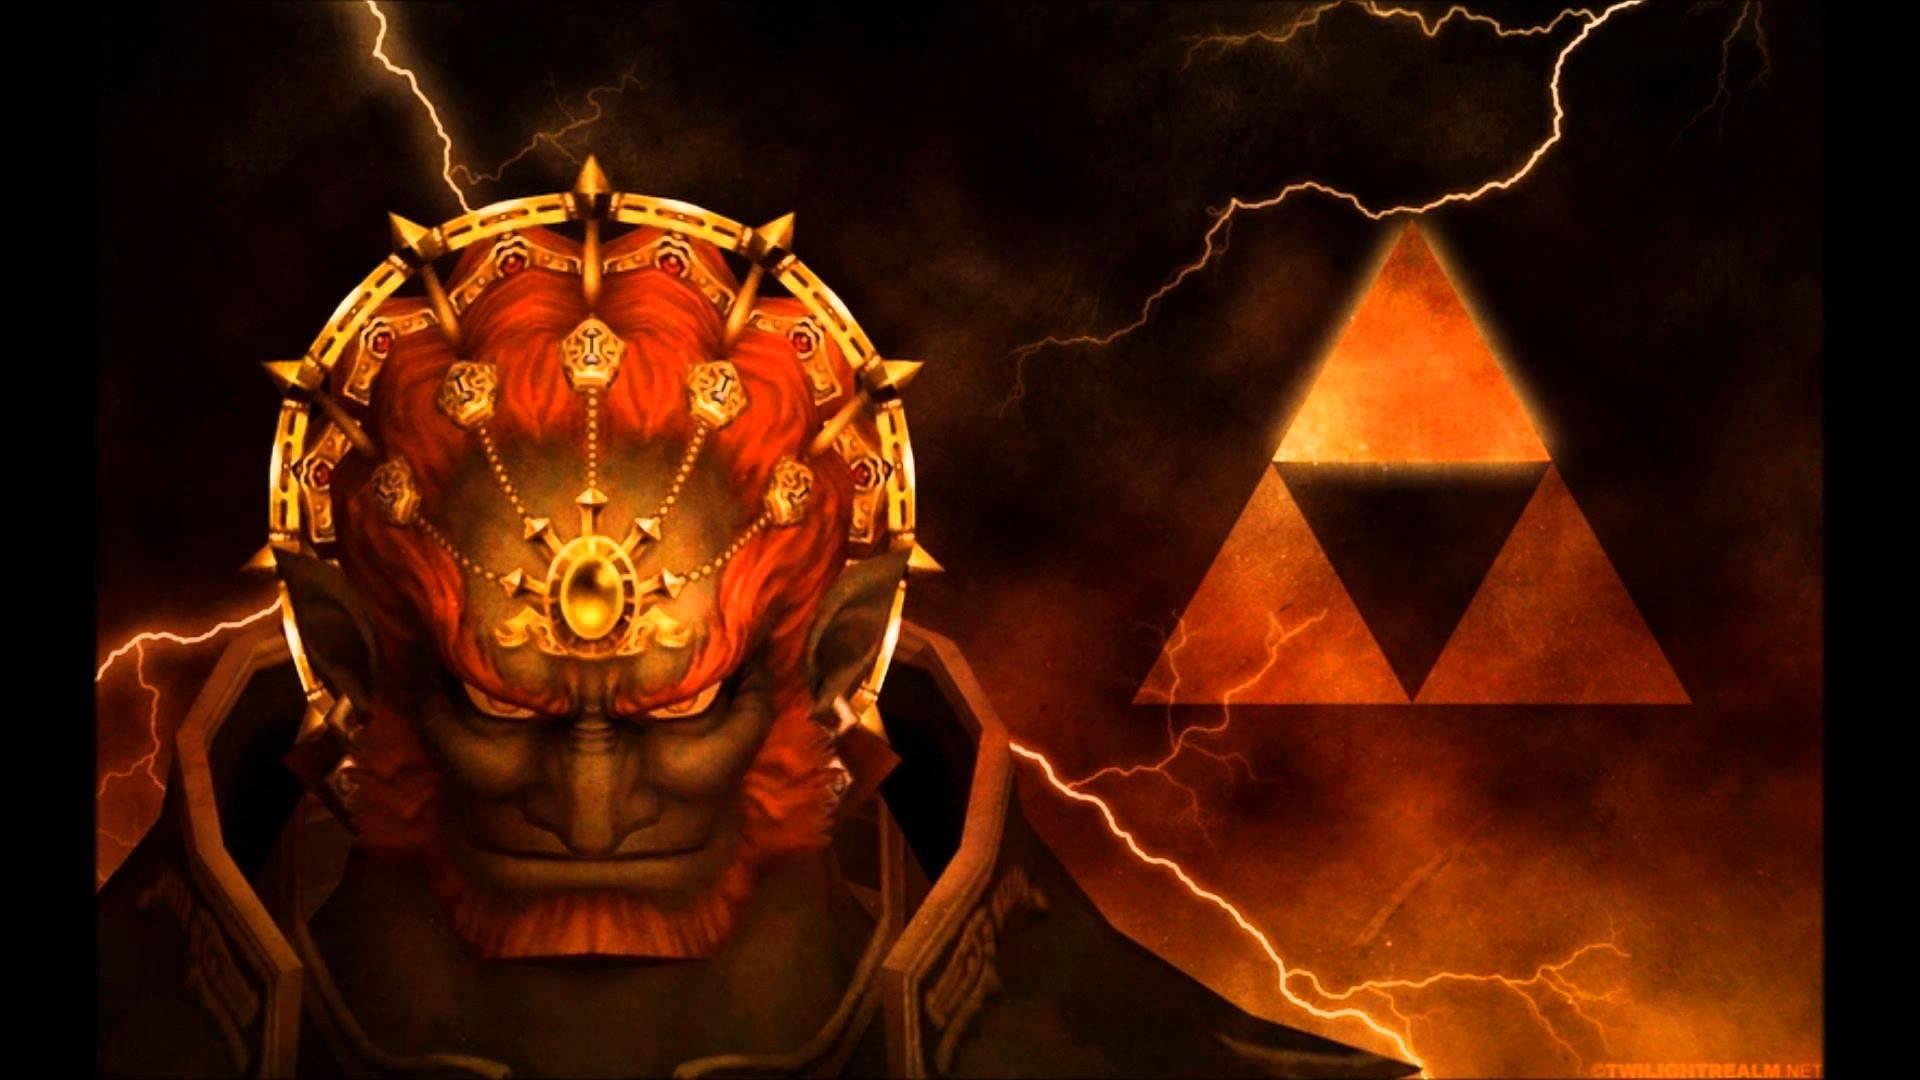 Legend of Zelda :Twilight Princess- Dark Lord Ganondorf Theme Remix